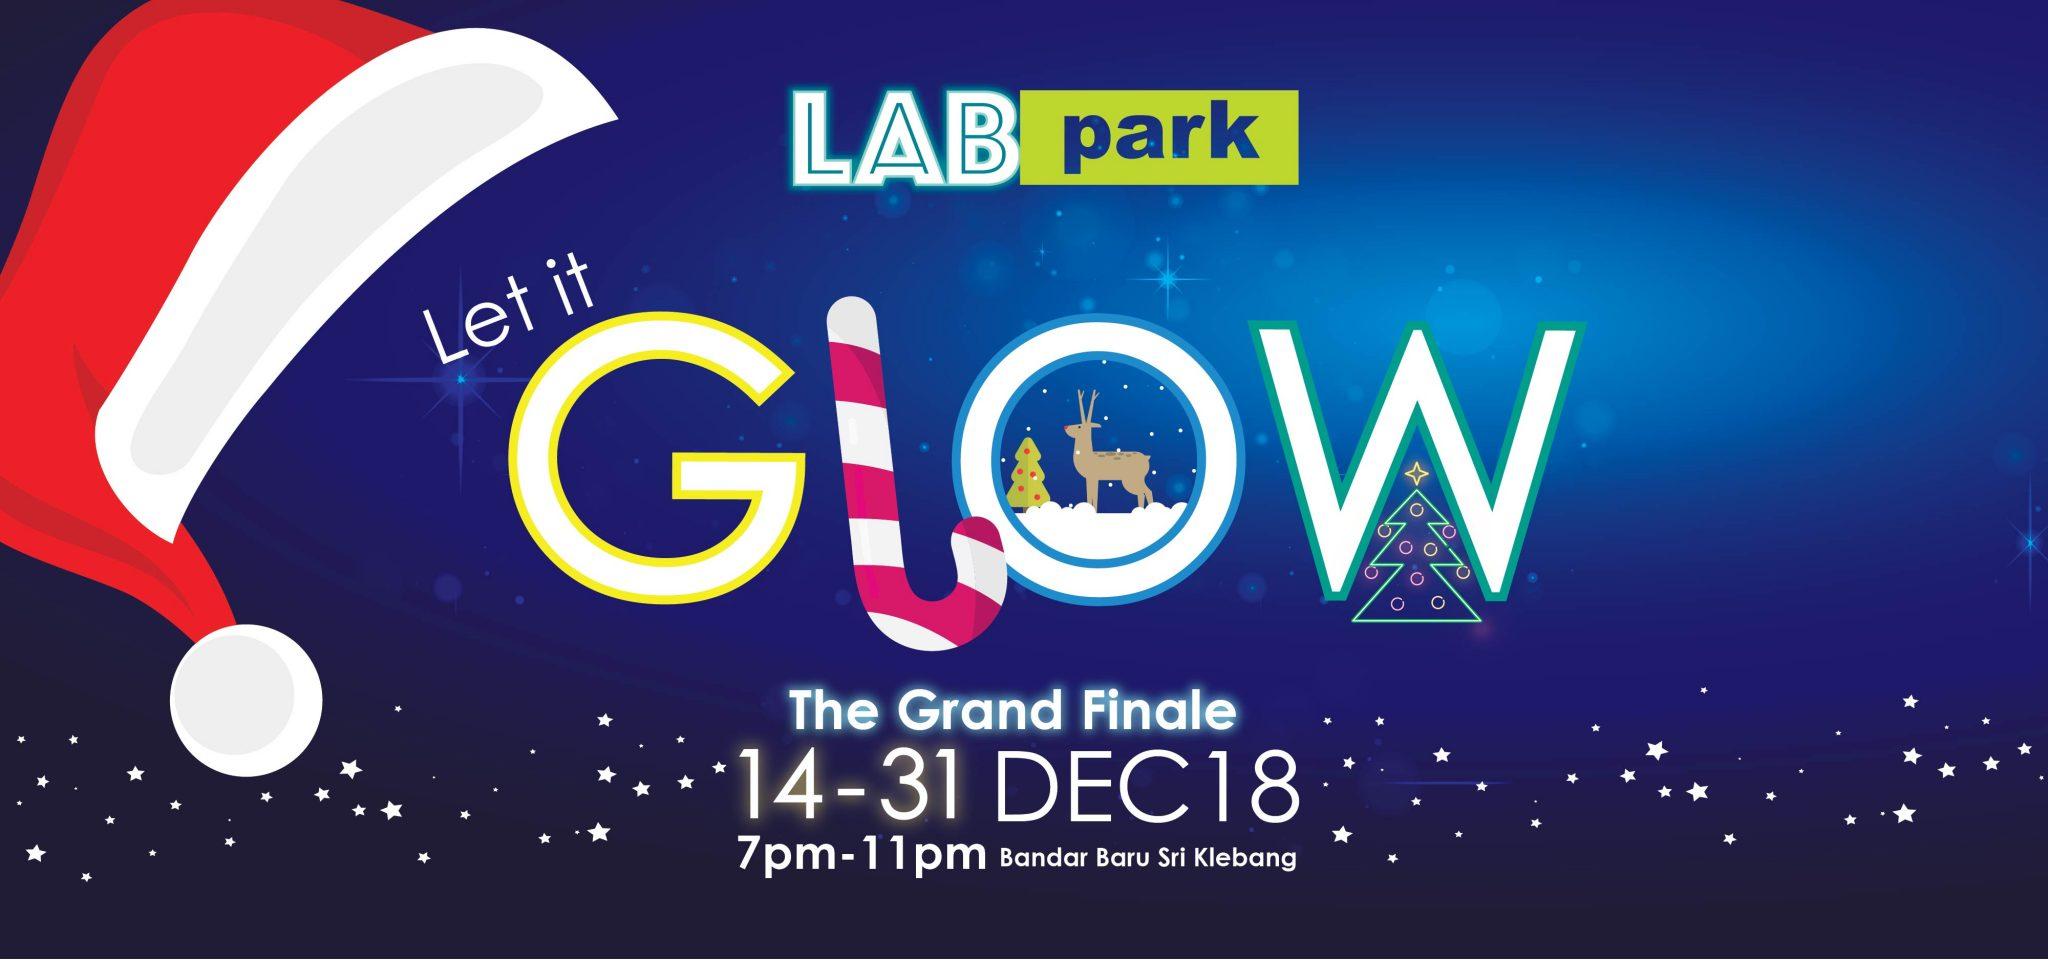 let it glow xmas